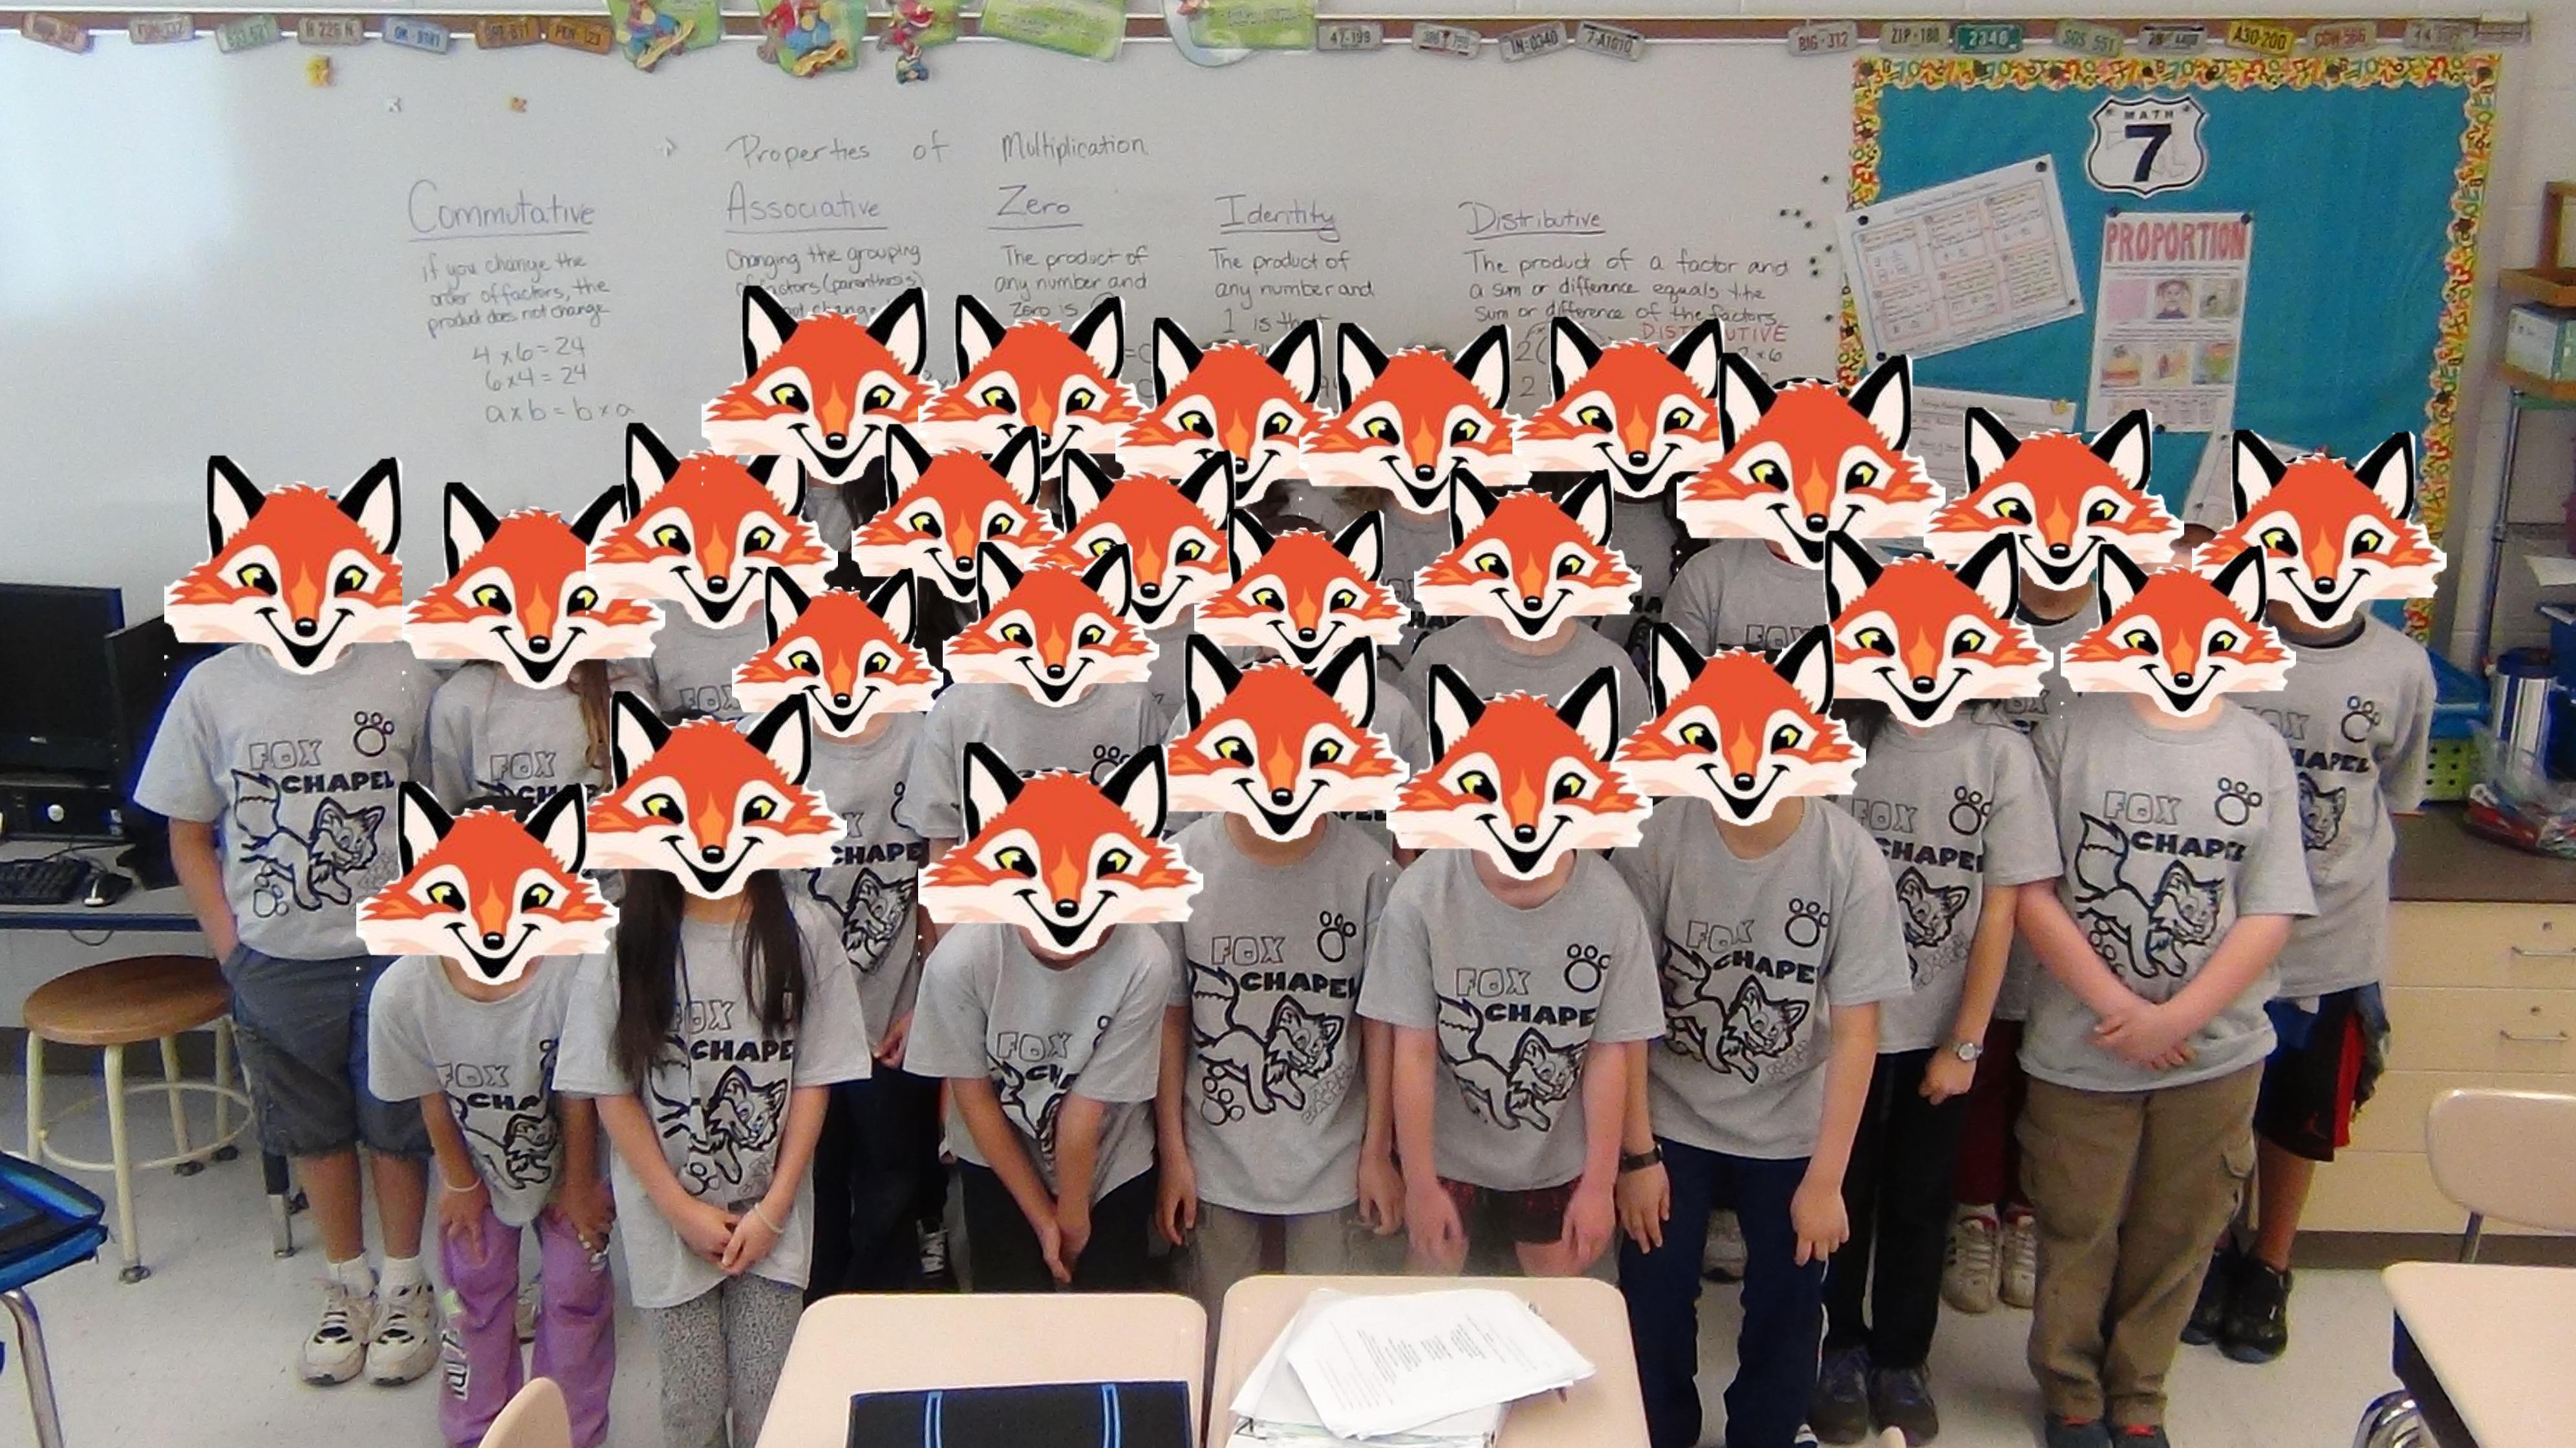 School shirt design your own - 5th Grade Class Shirts